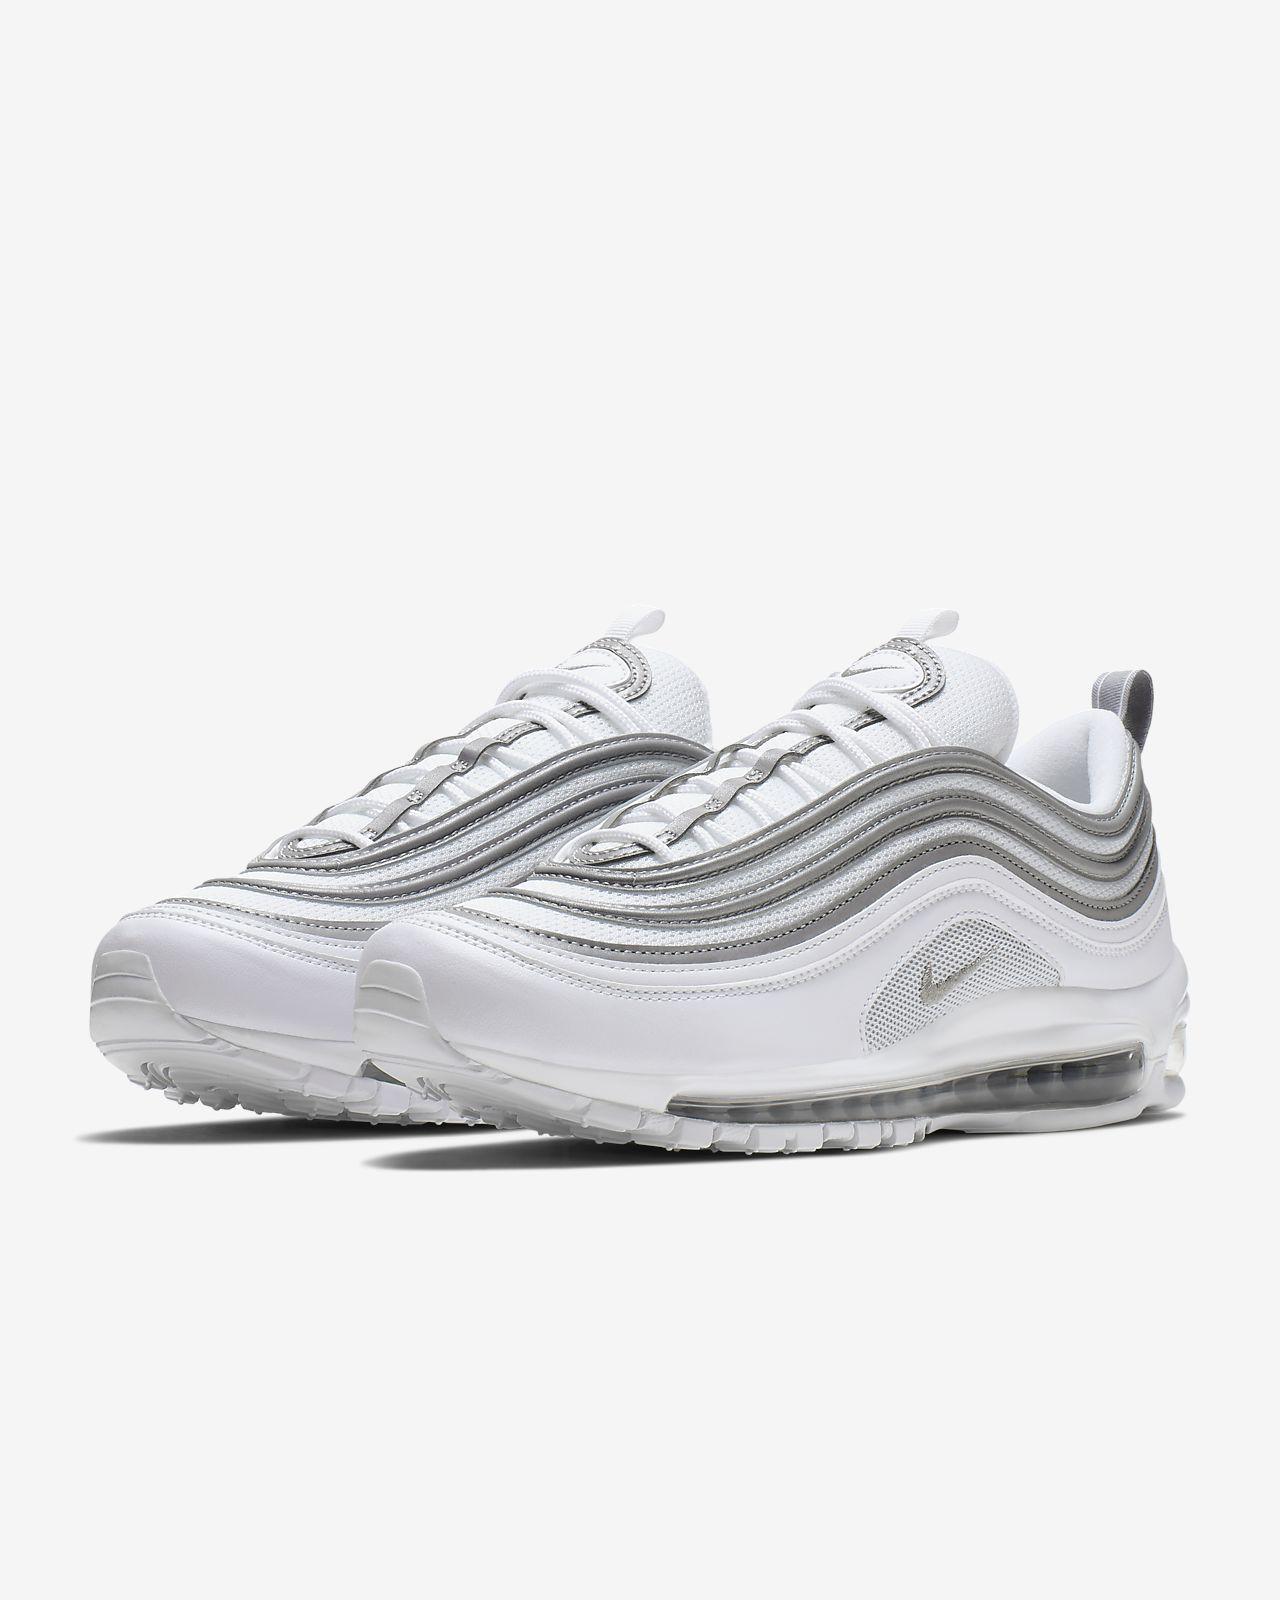 reputable site 4708b 31a2a ... รองเท้าผู้ชาย Nike Air Max 97